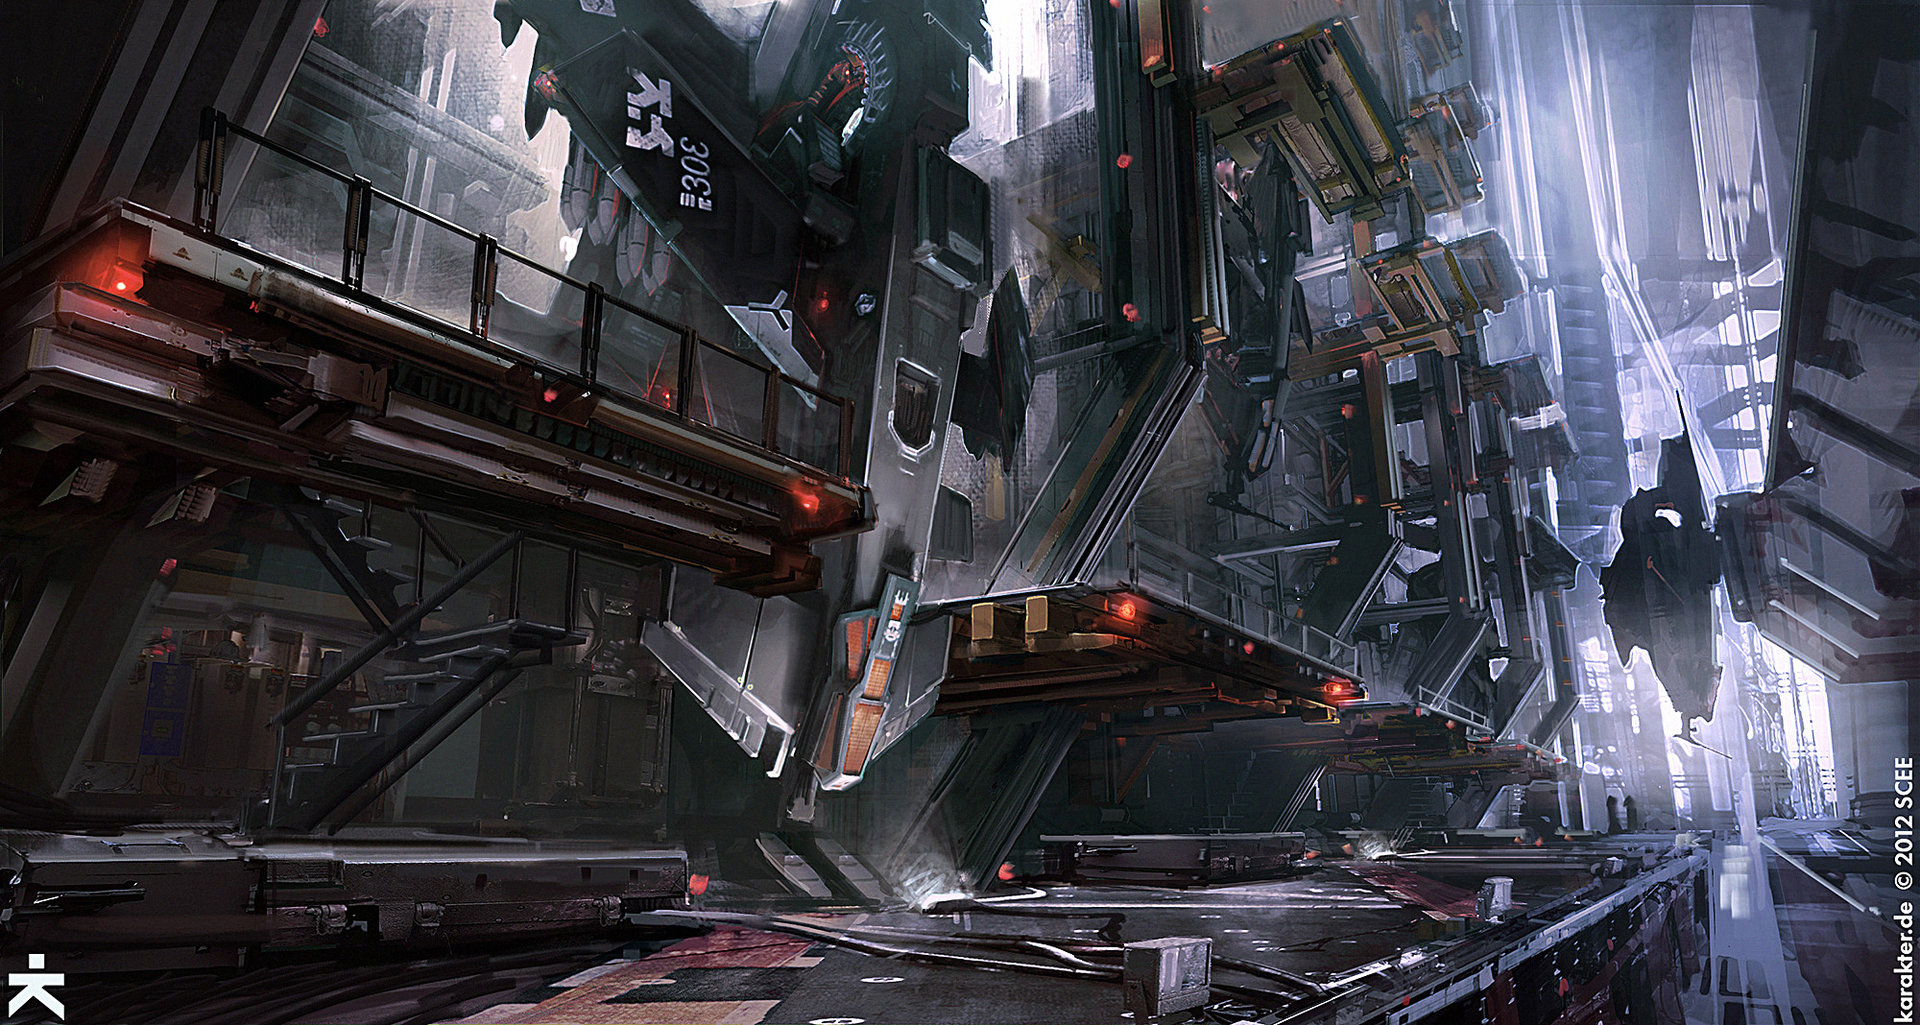 The Futuristic & Sci-Fi Artworks of Mike Hill